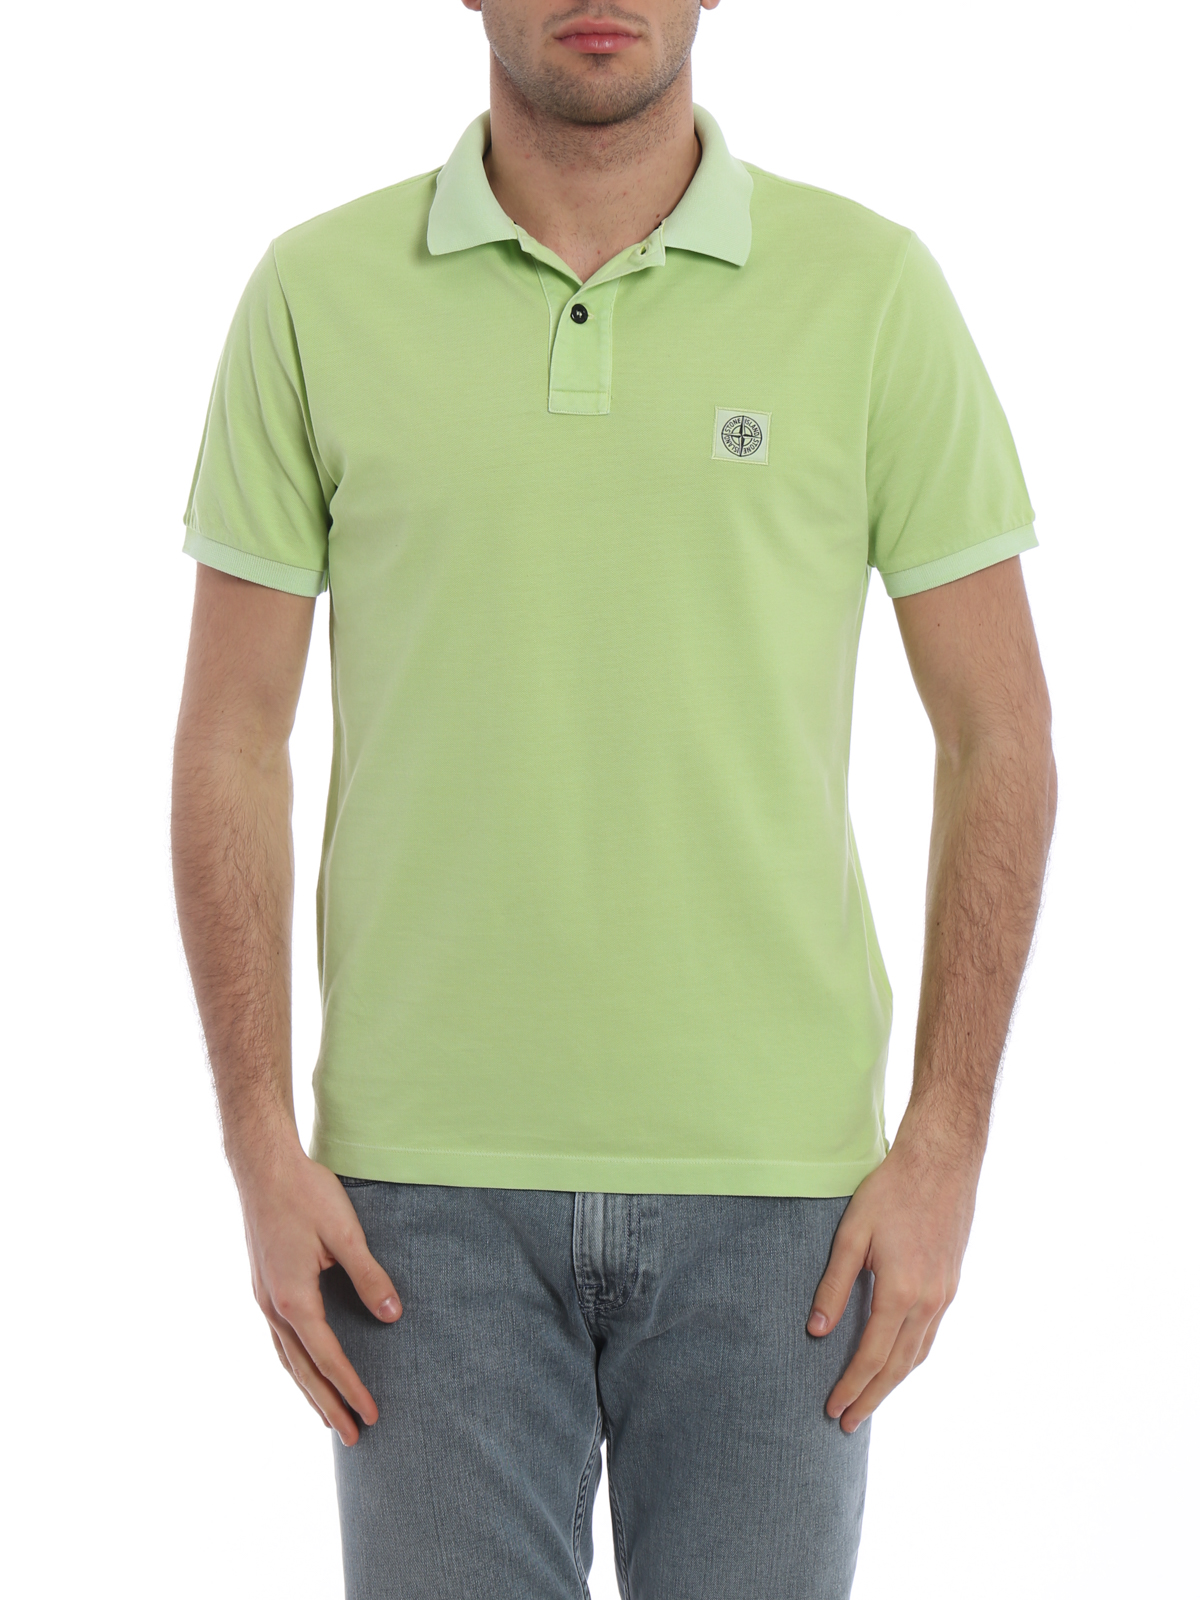 Stone Island Green Garment-Dyed Polo Shirt